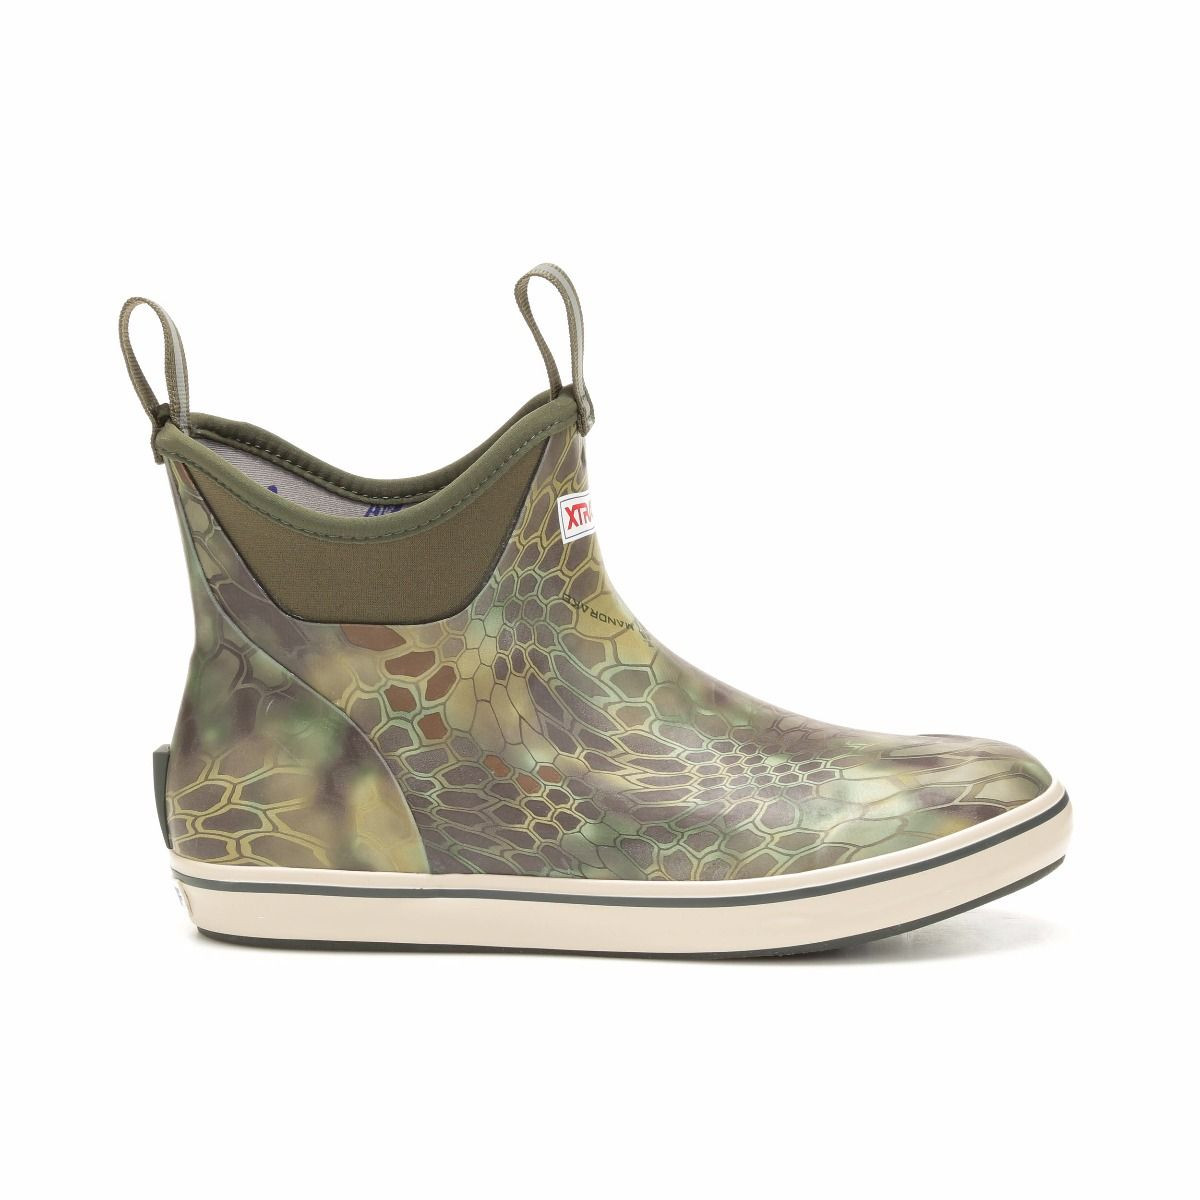 "Xtratuf Kryptek Ankle Deck Boot 6"" Kryptek Moss"